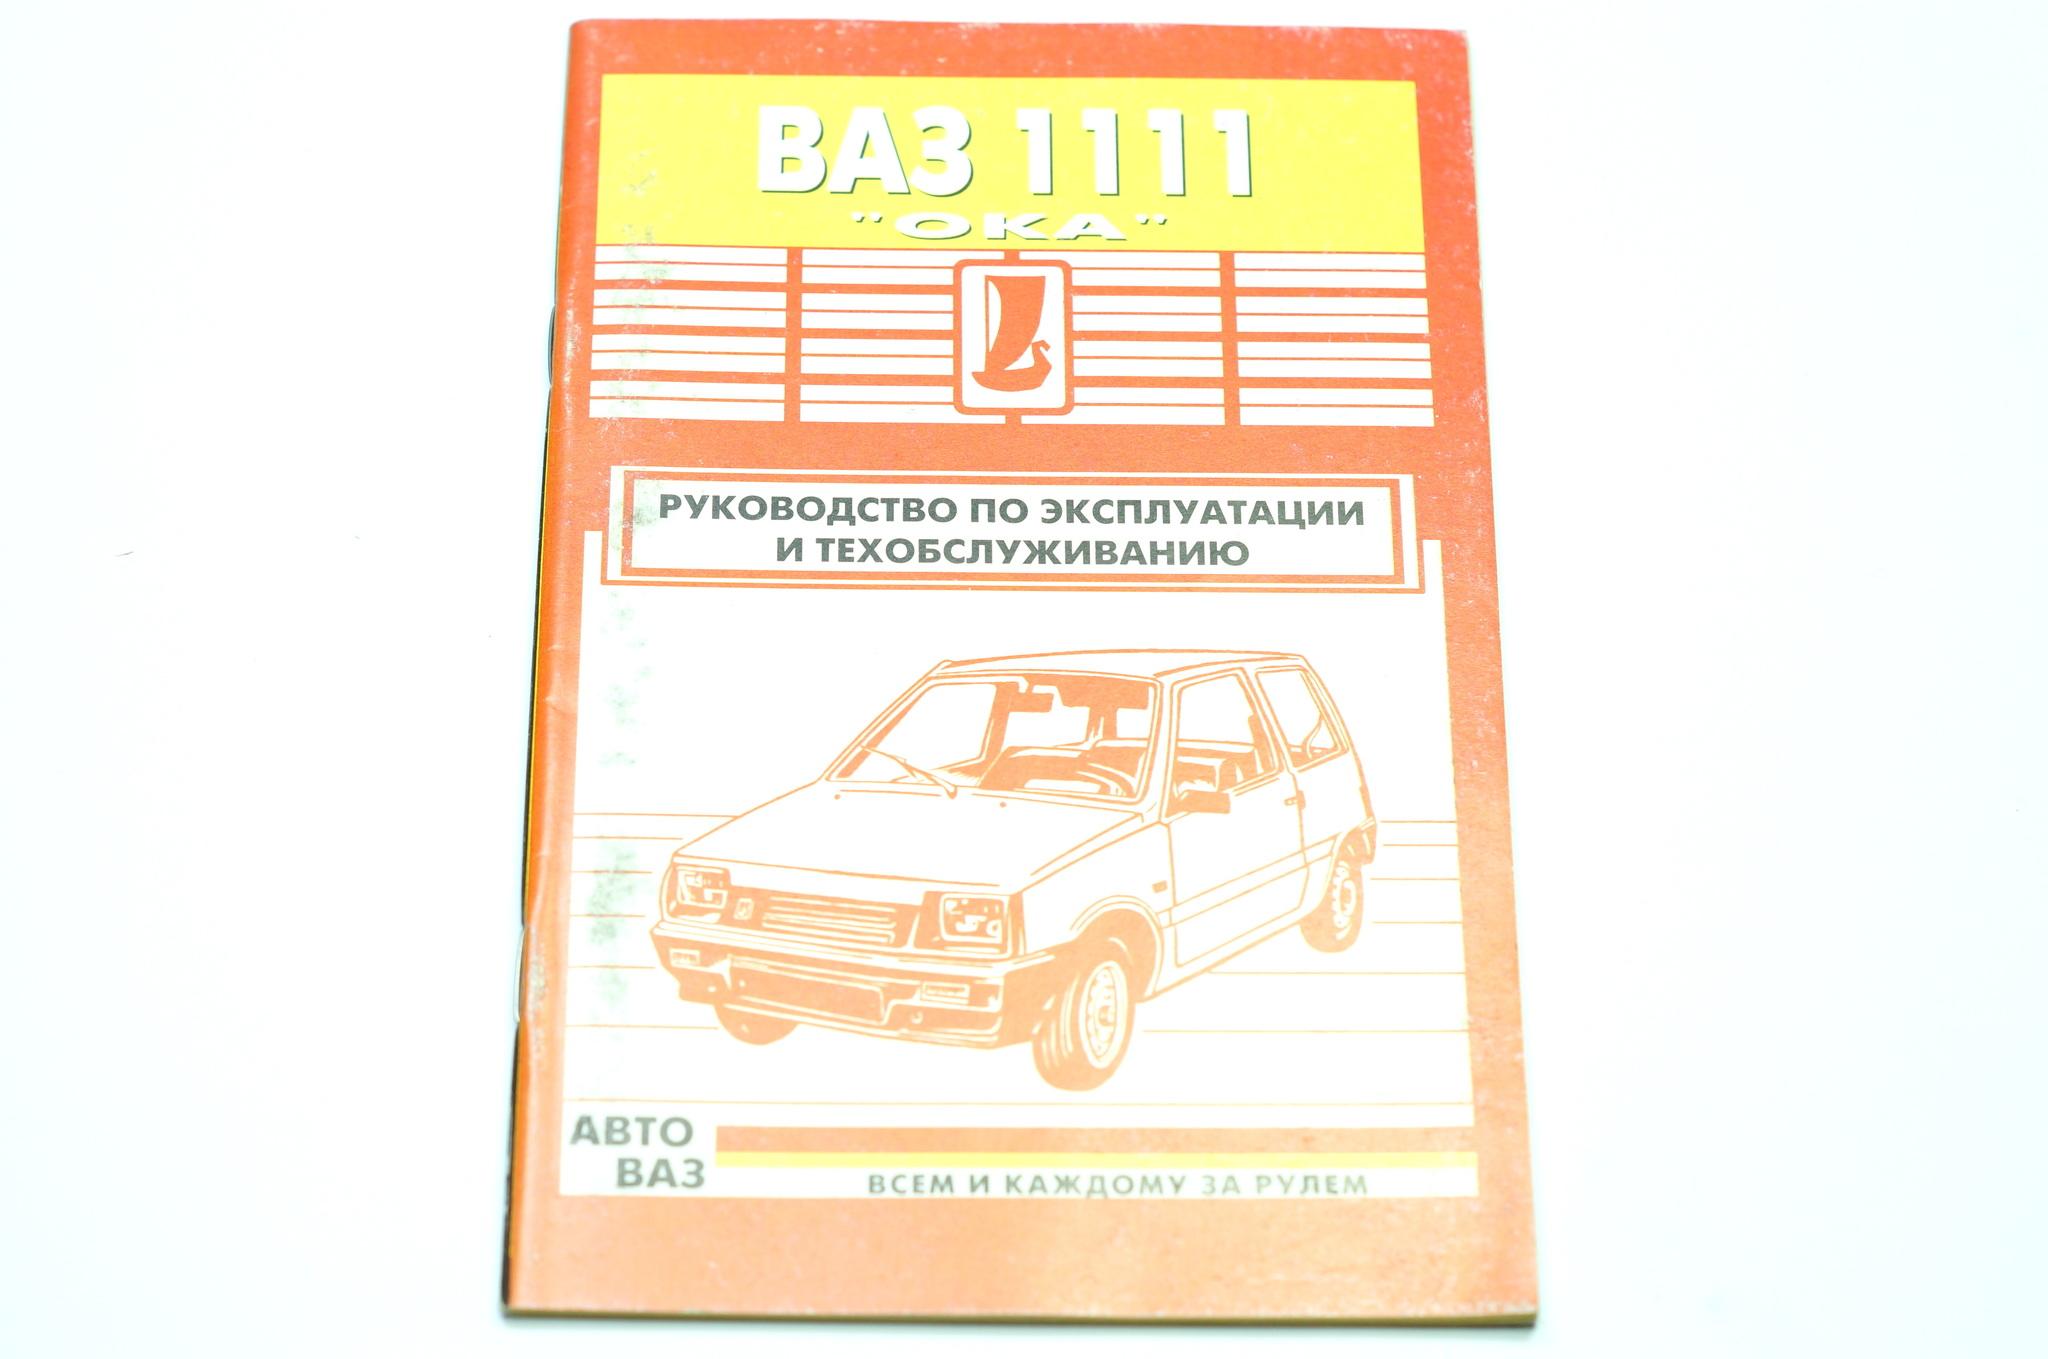 Книга по эксплуатации и техобслуживанию ВАЗ 1111